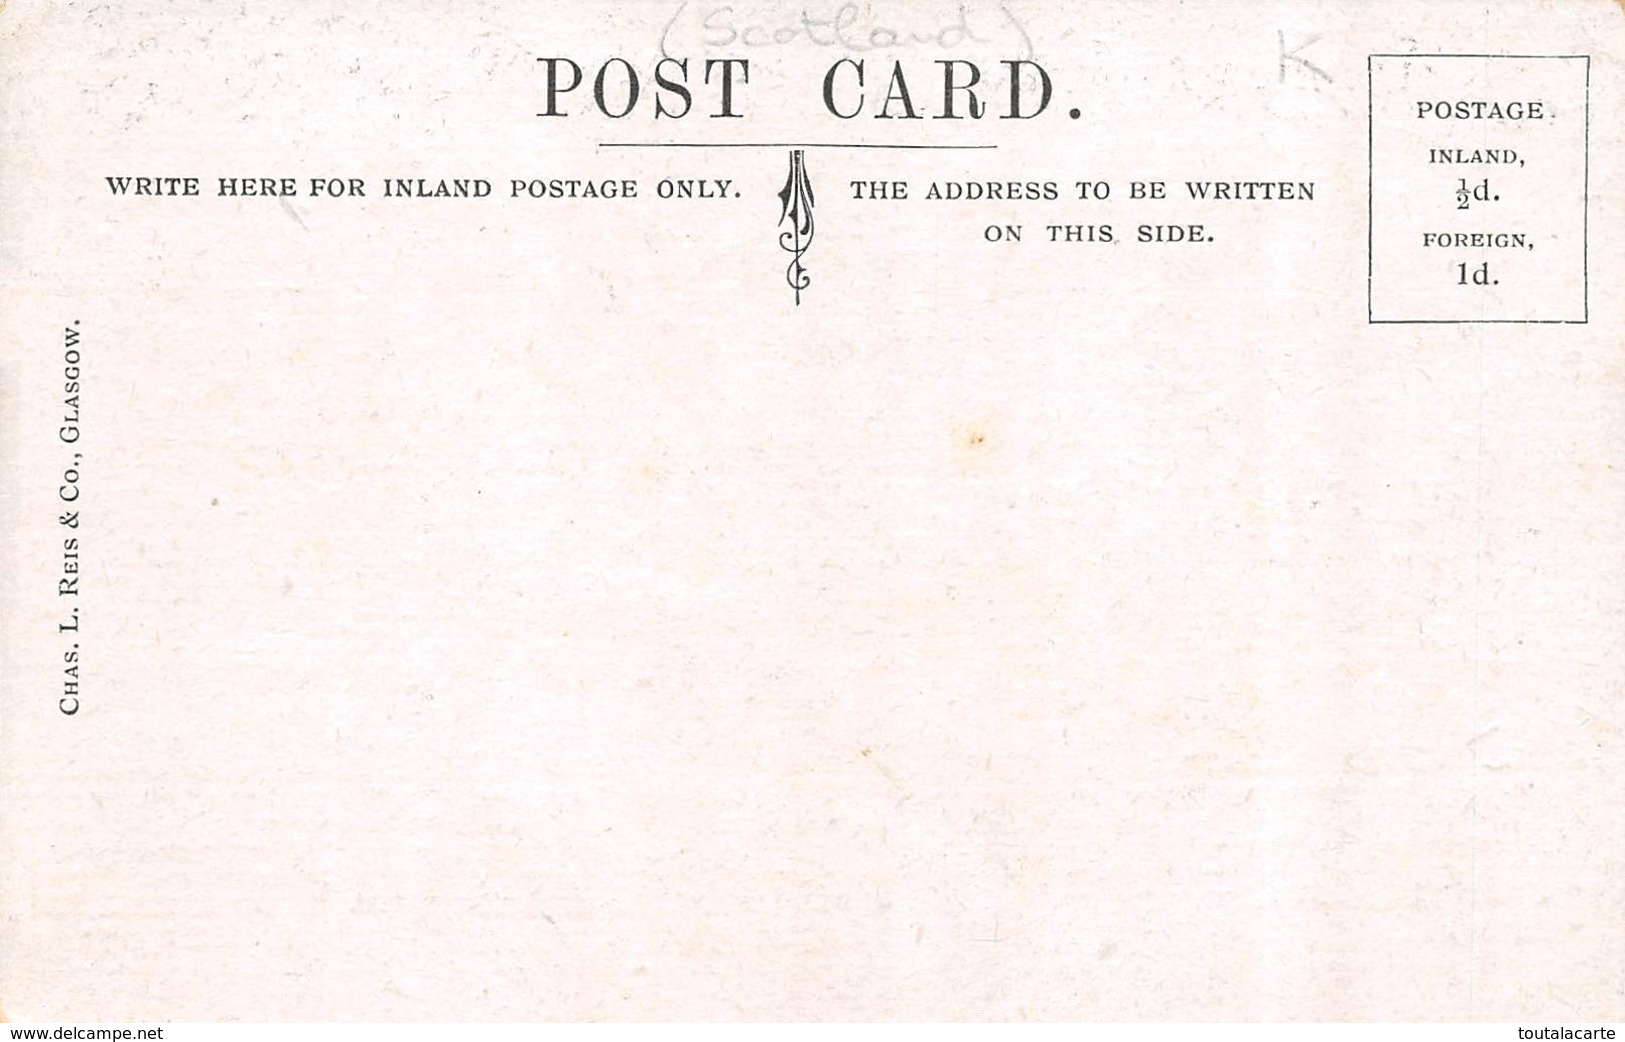 POST CARD SCOTTISH GLASGOW 209 215 ARGYLE ST - 2 AND 4 JAMAICA ST - Lanarkshire / Glasgow